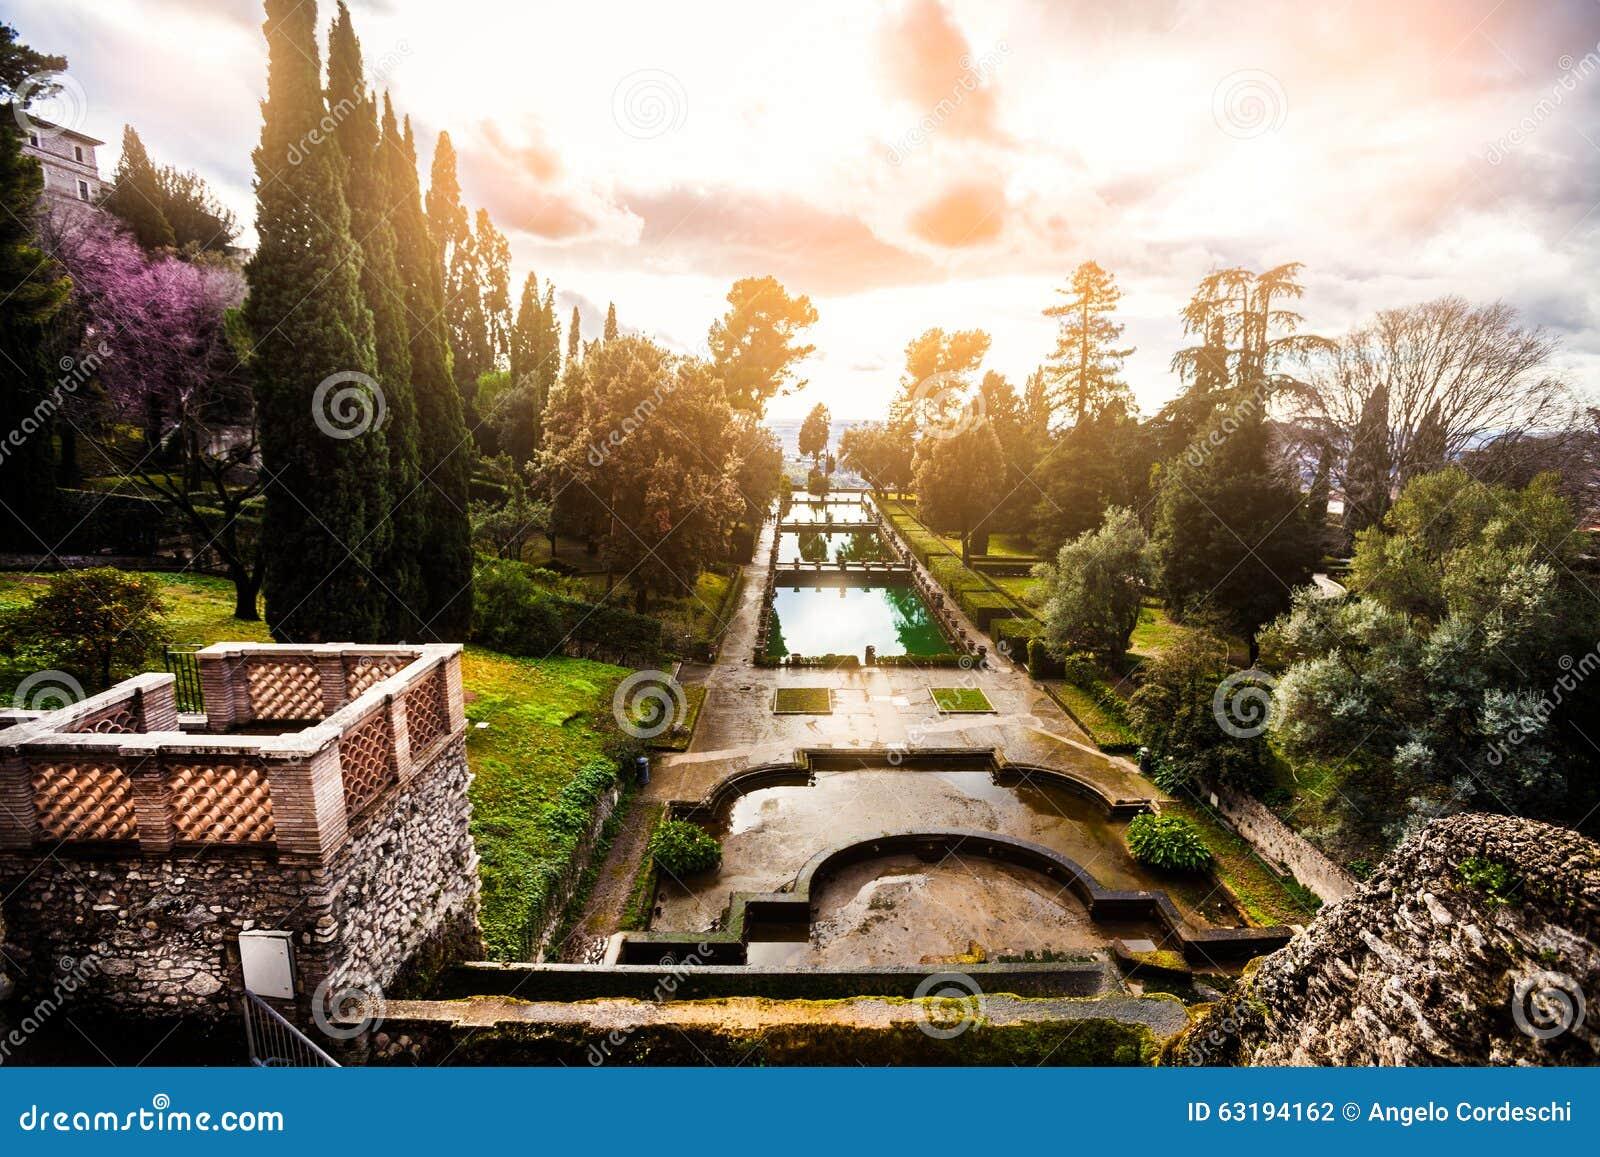 Paysage fabuleux jardins et fontaines jardin italien de for Jardin italien